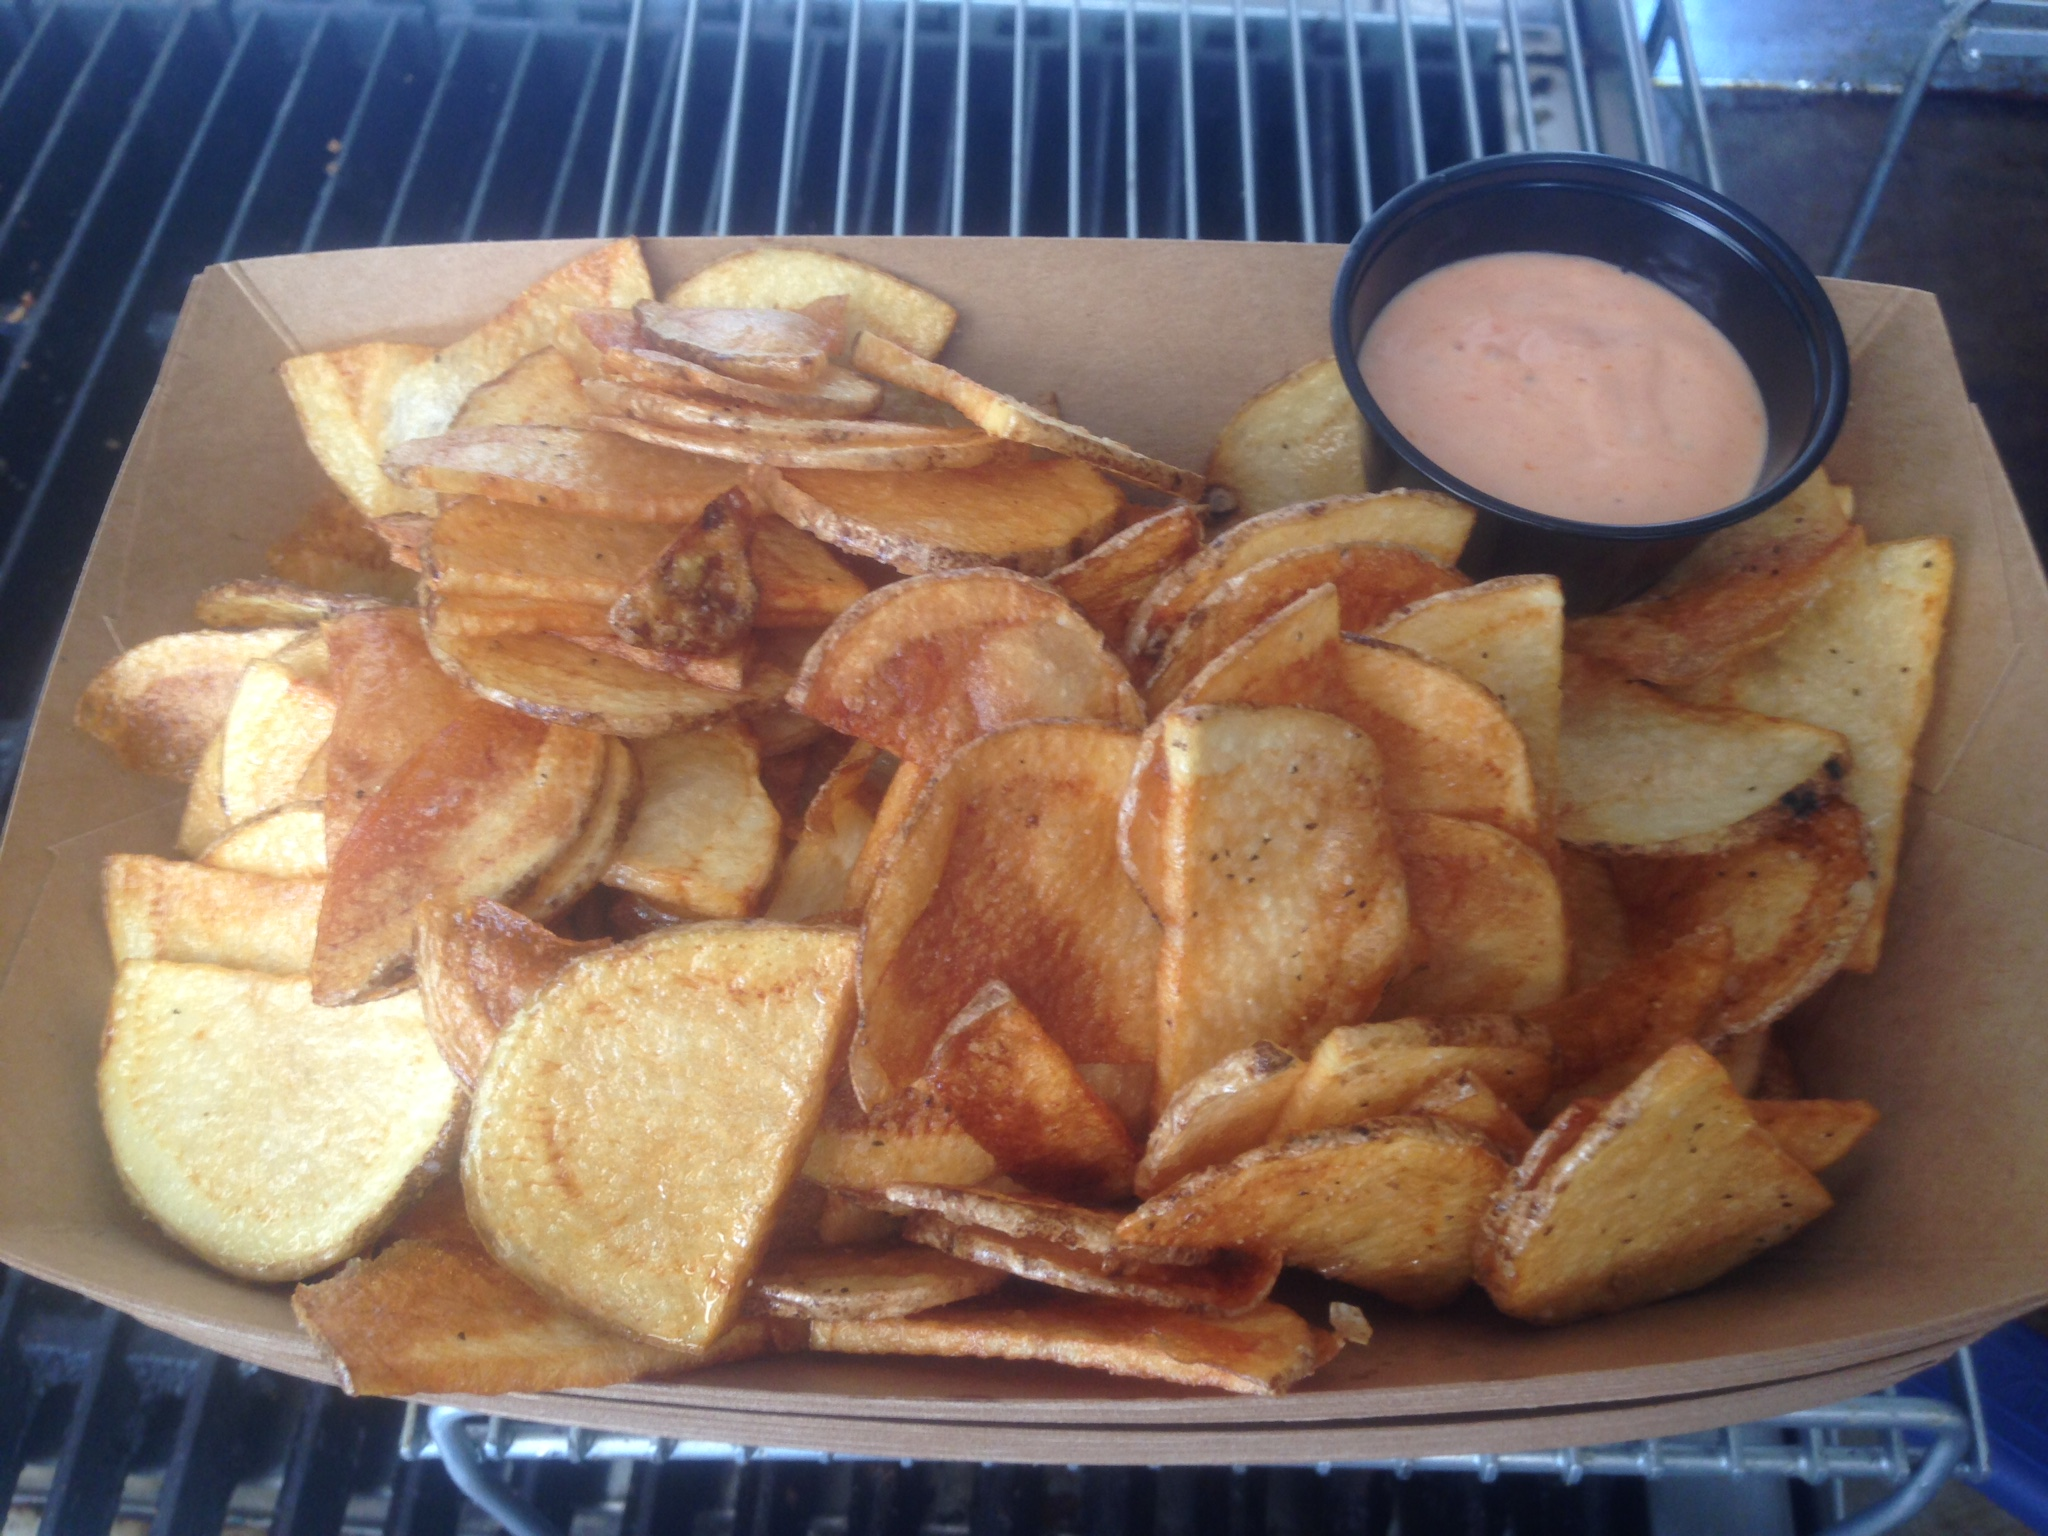 Truck-Fried Potatoes & KM Sauce